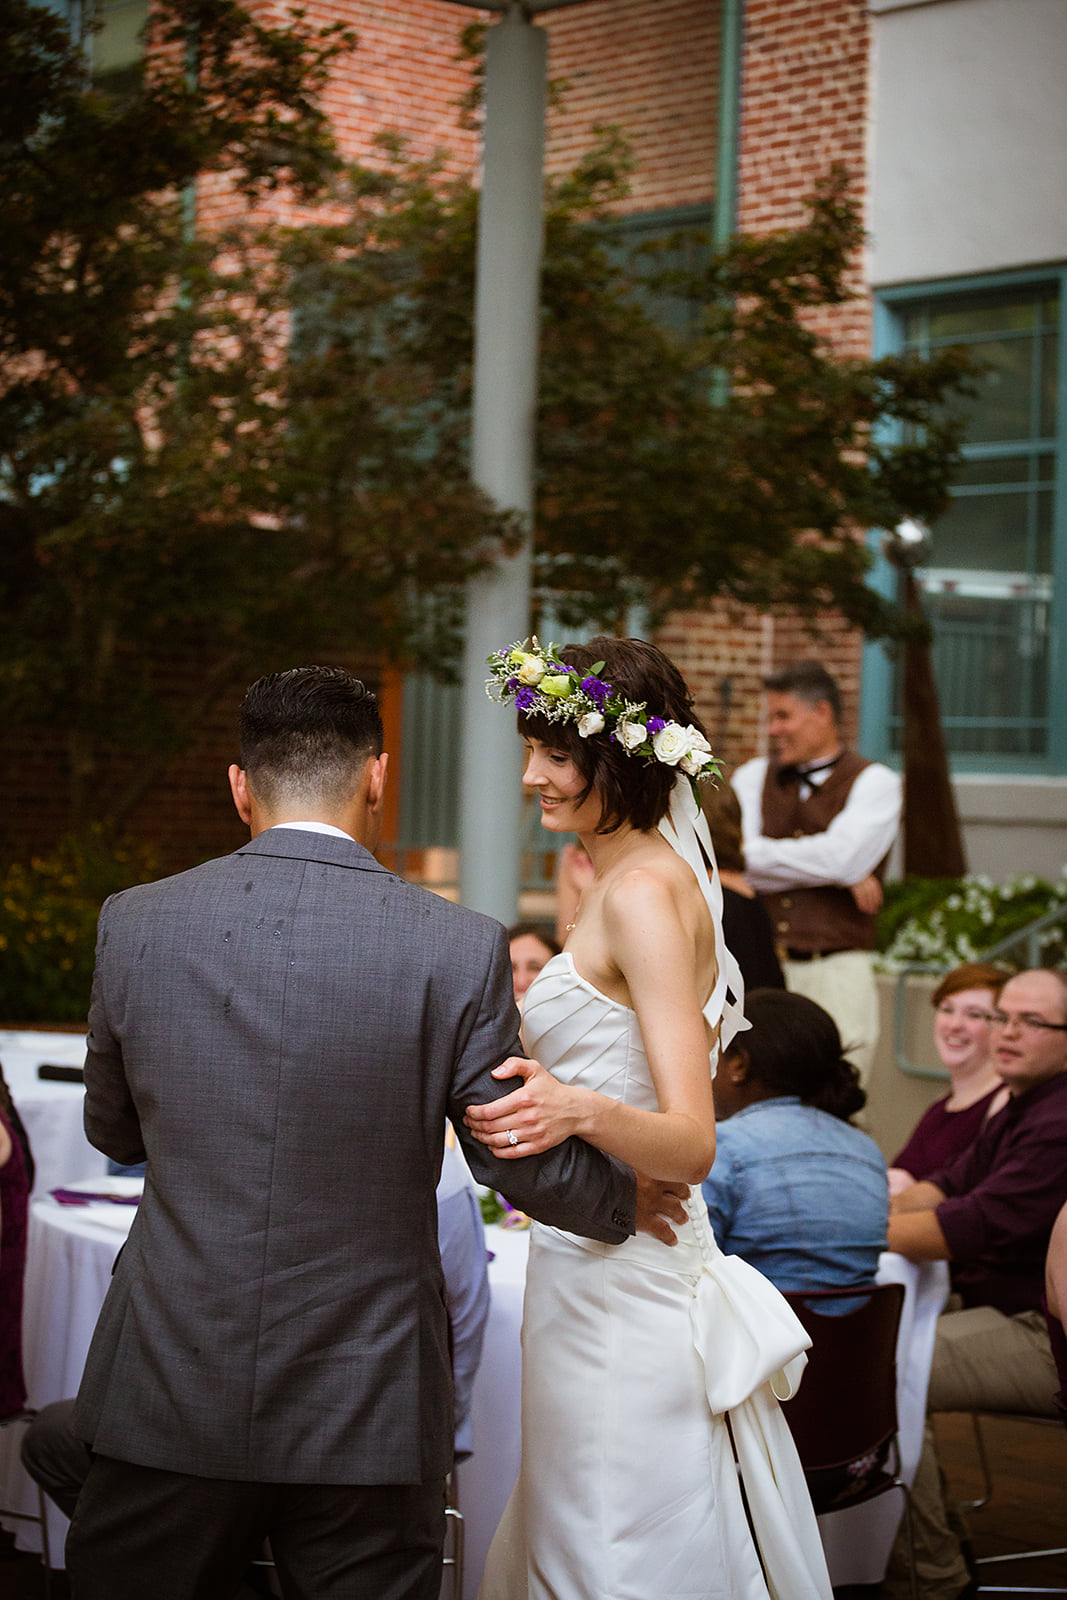 Blacano Wedding - Reception-19.jpg